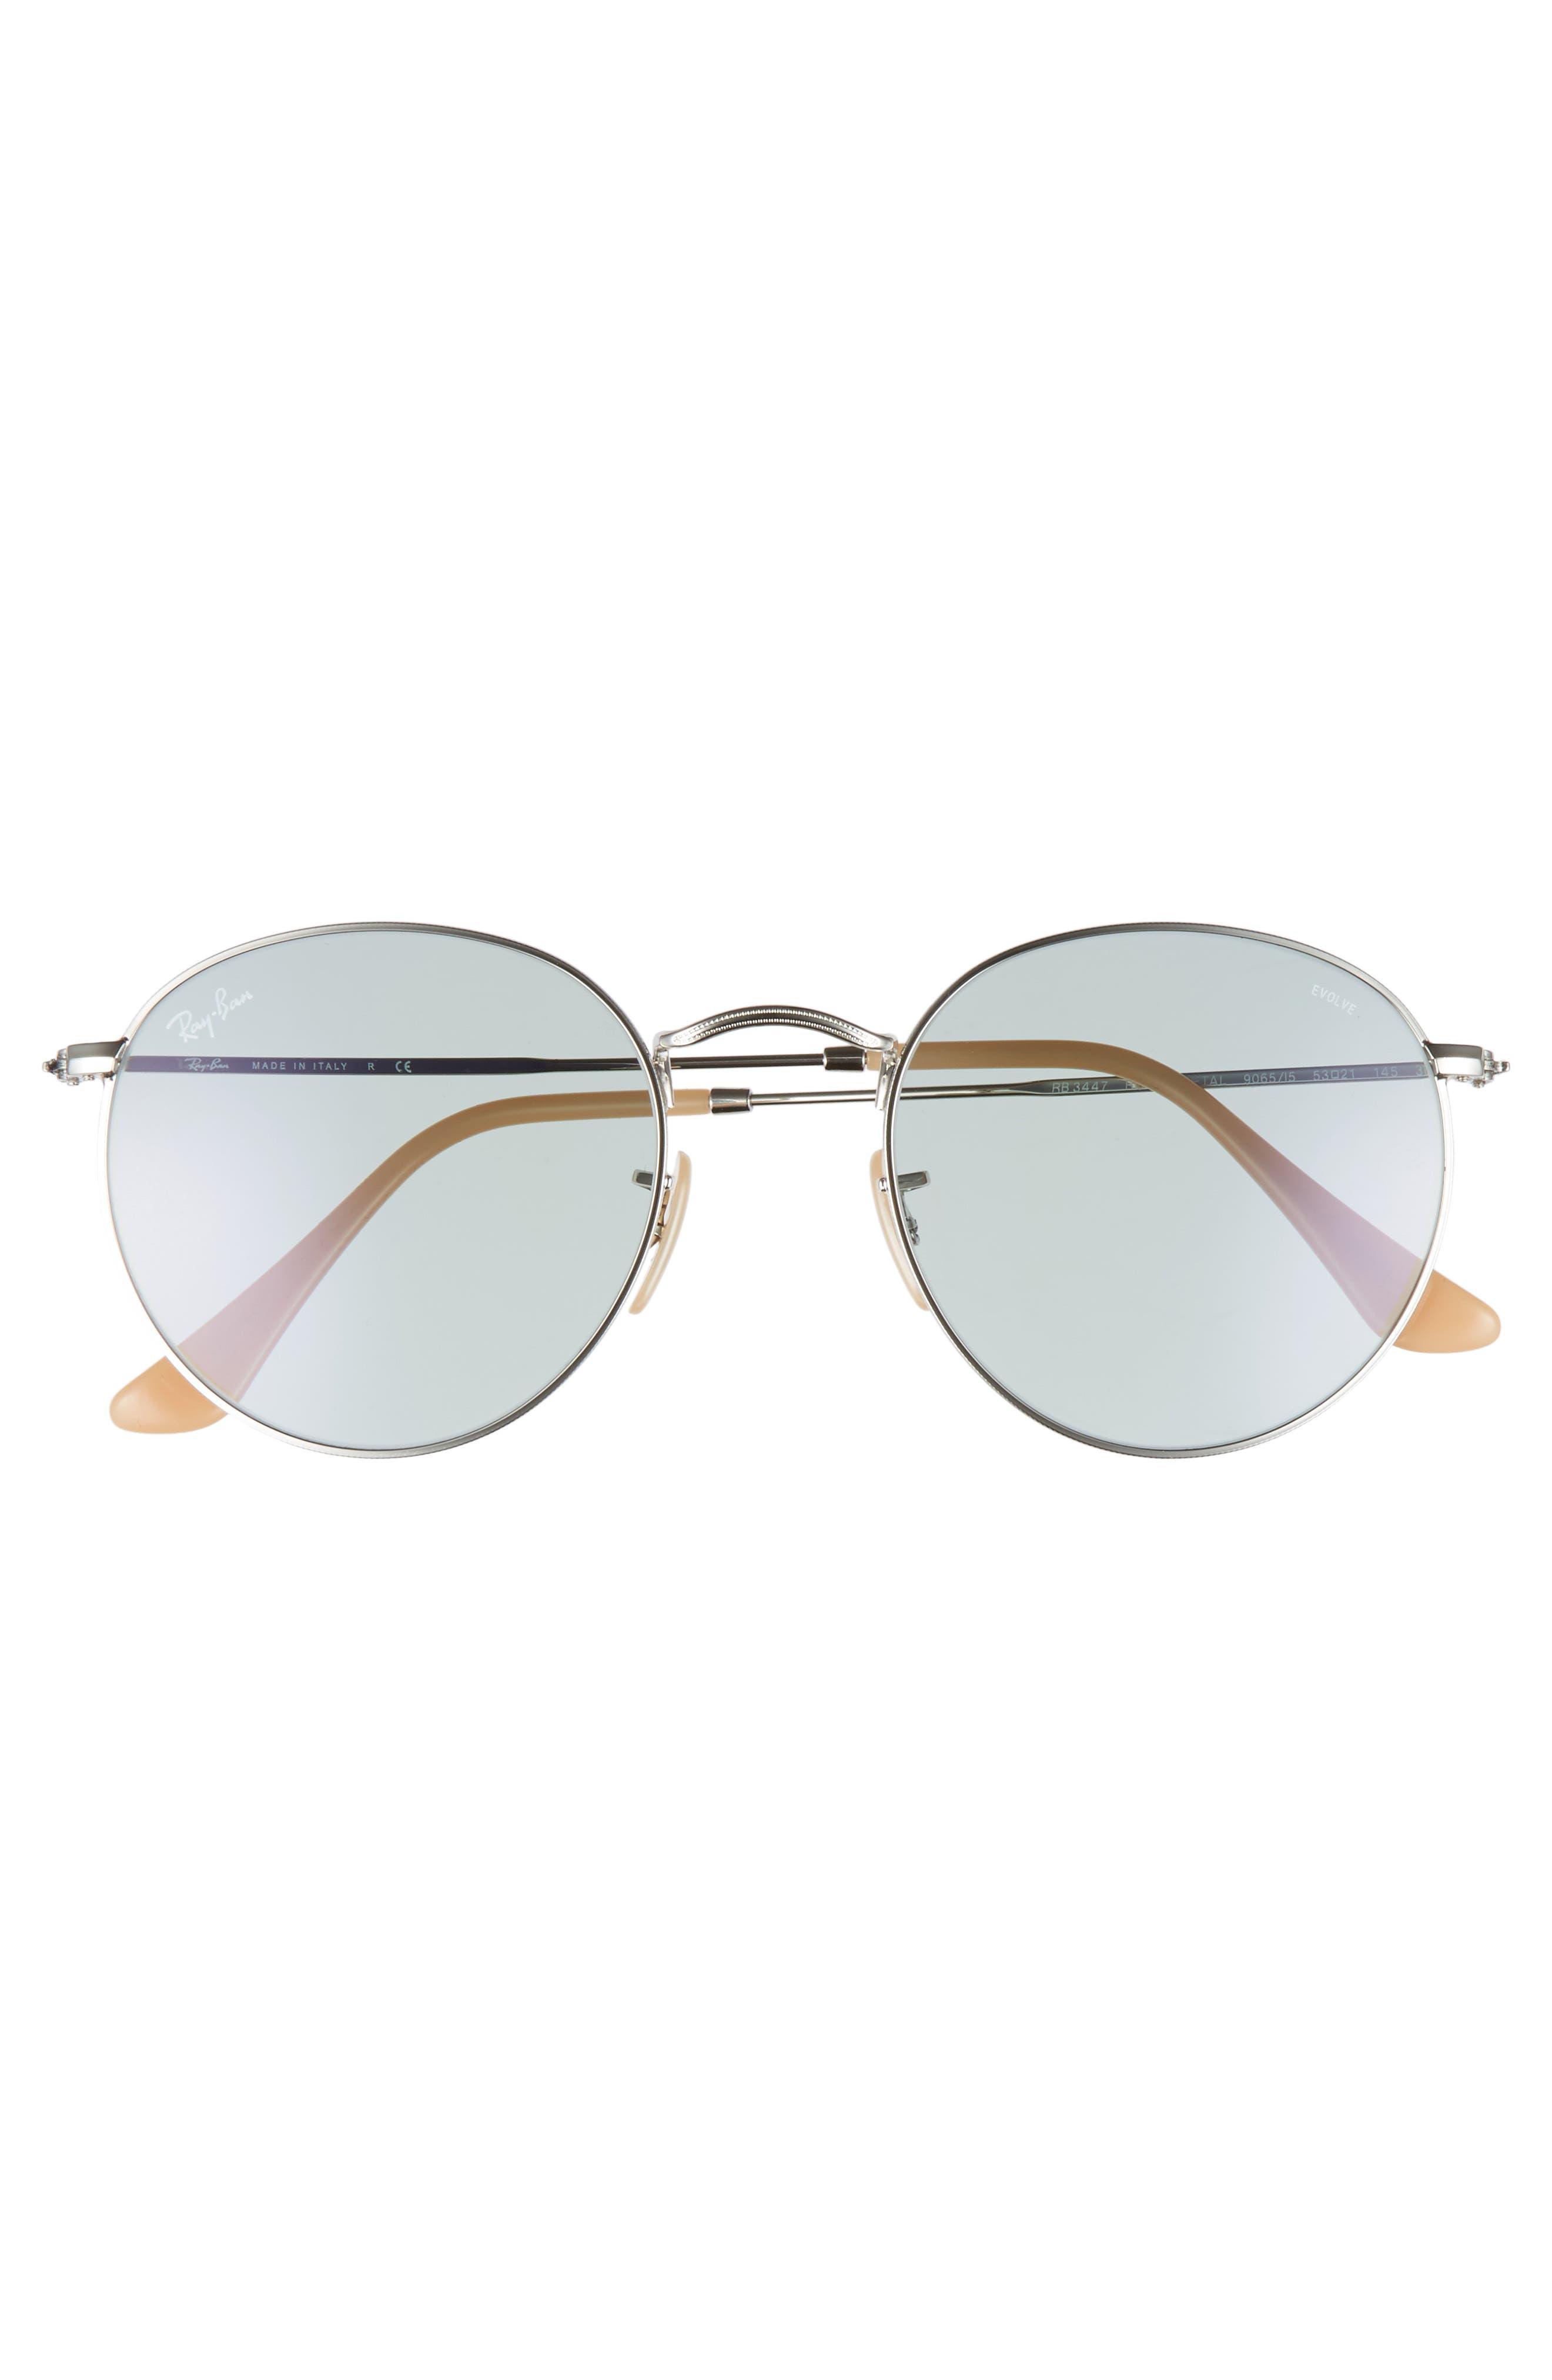 53mm Polarized Round Sunglasses,                             Alternate thumbnail 3, color,                             Silver Blue